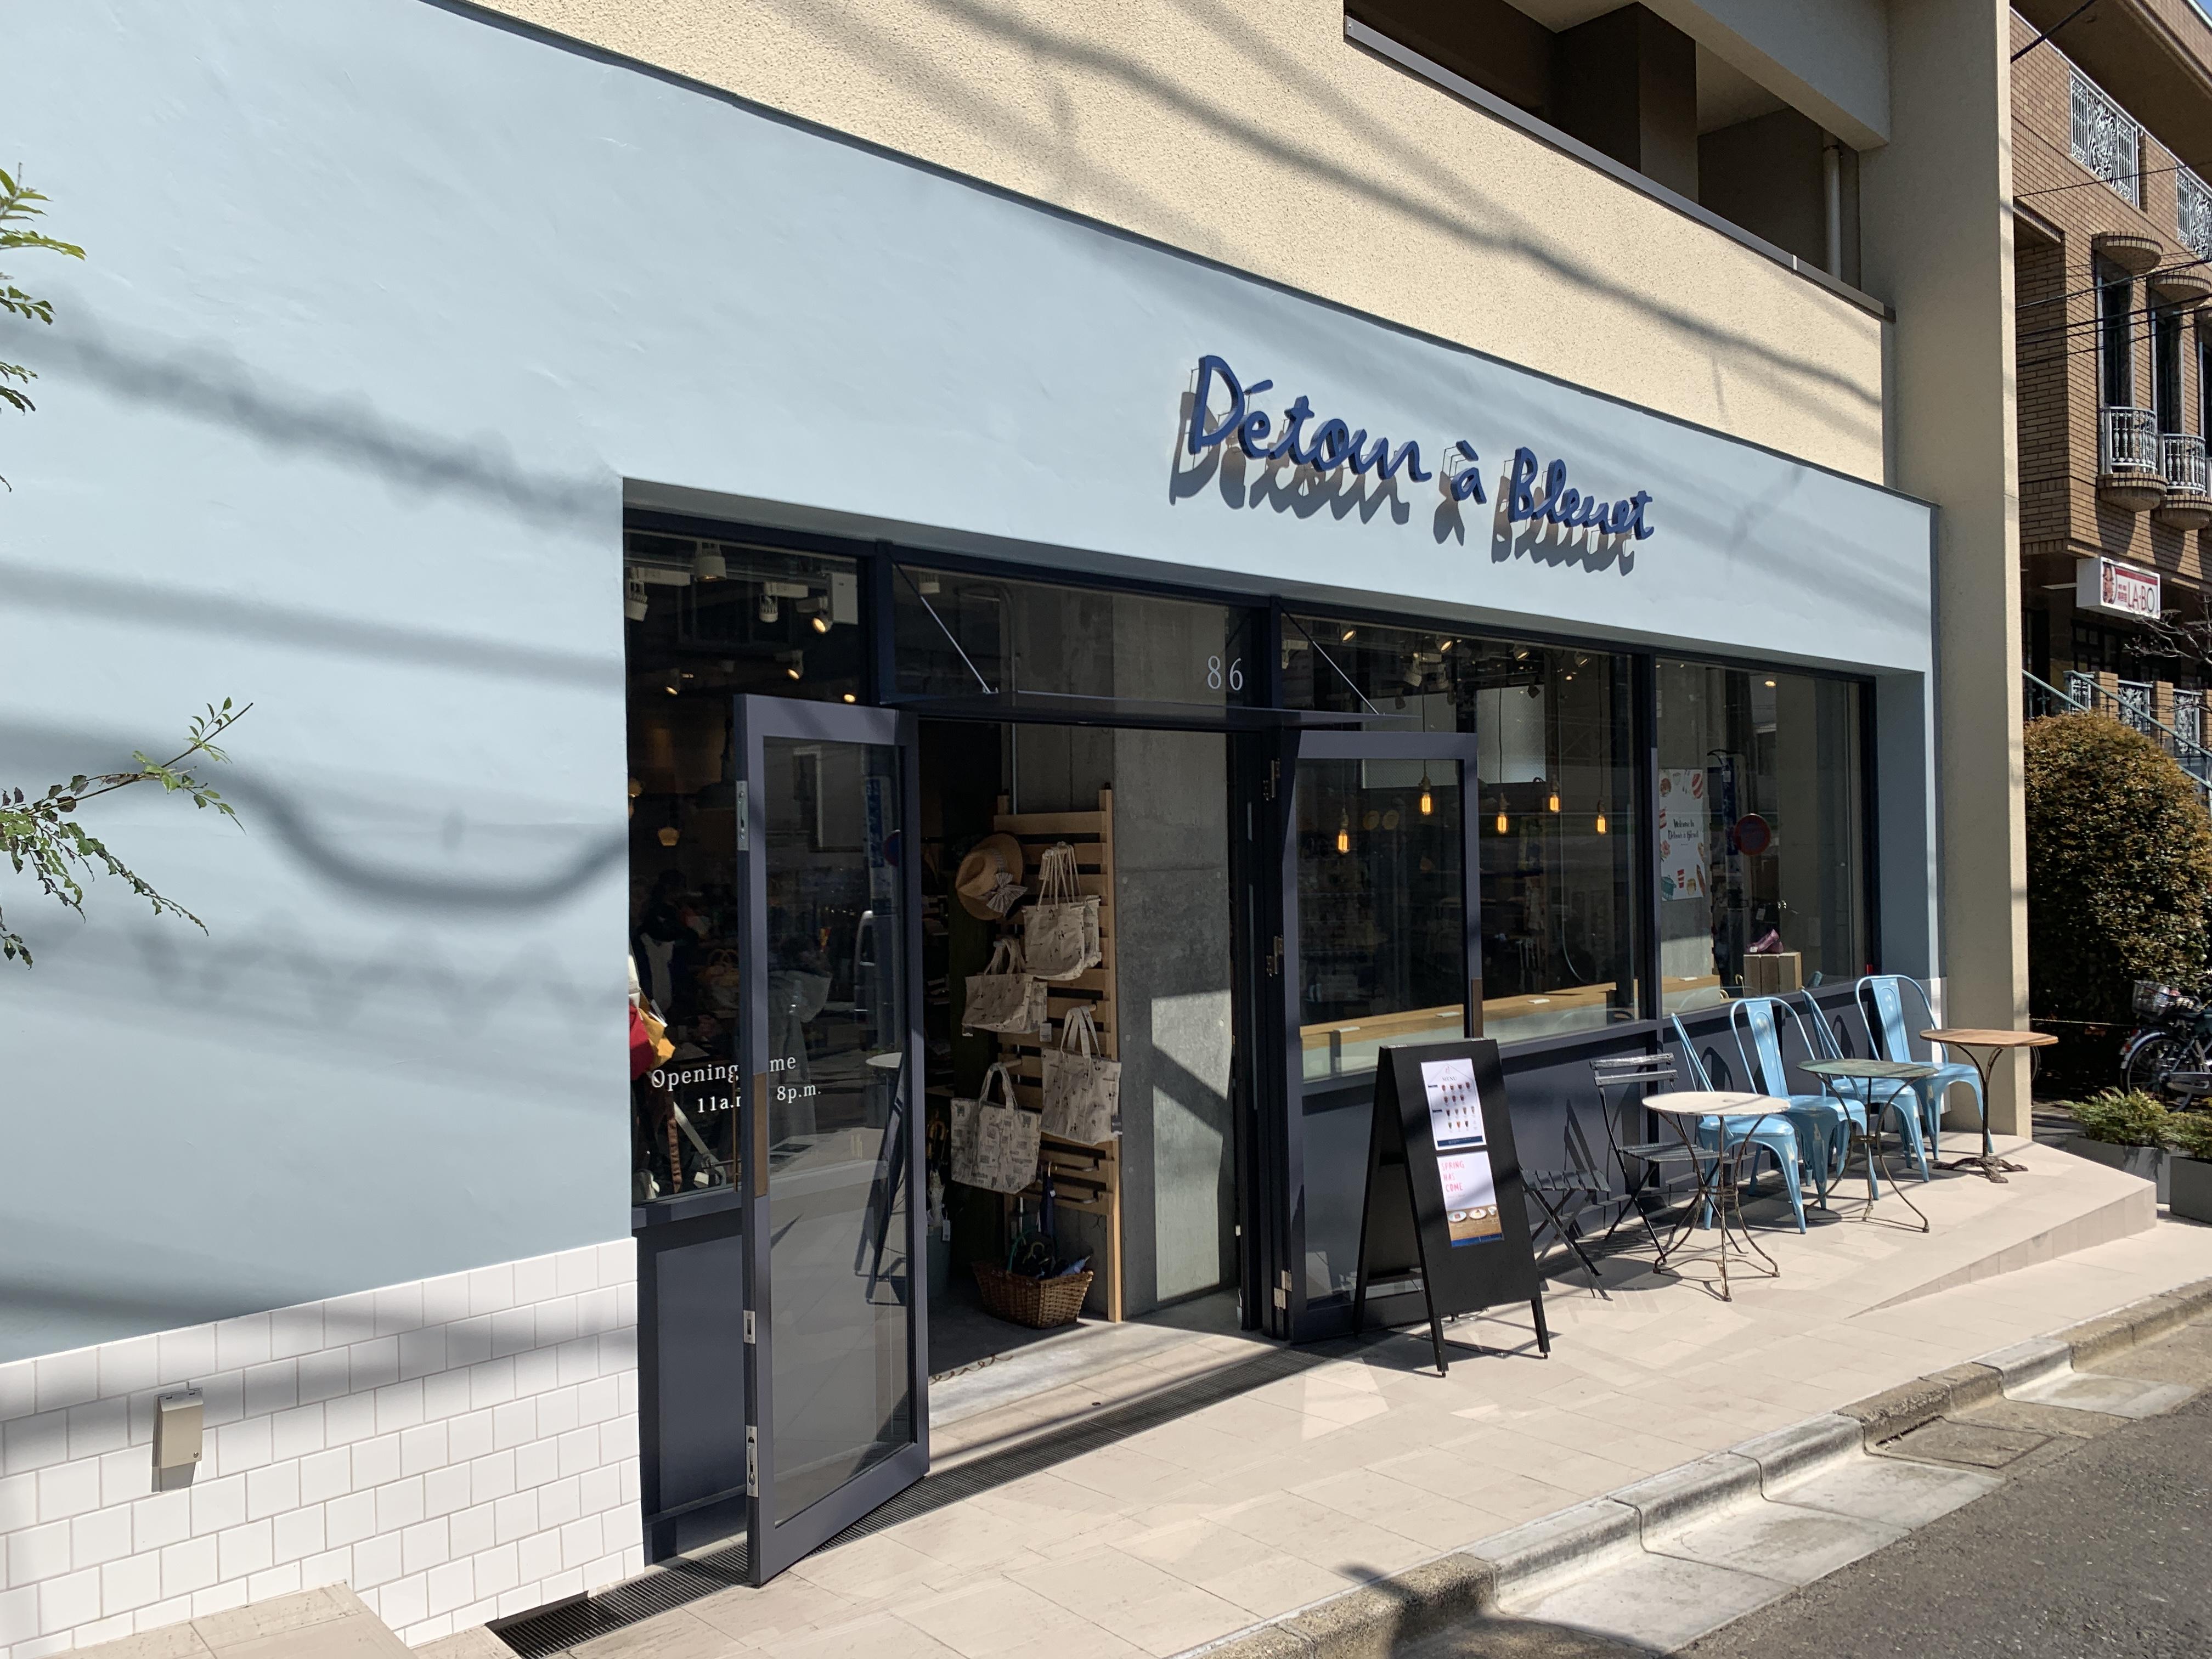 下北沢 雑貨屋さん Détour à Bleuet